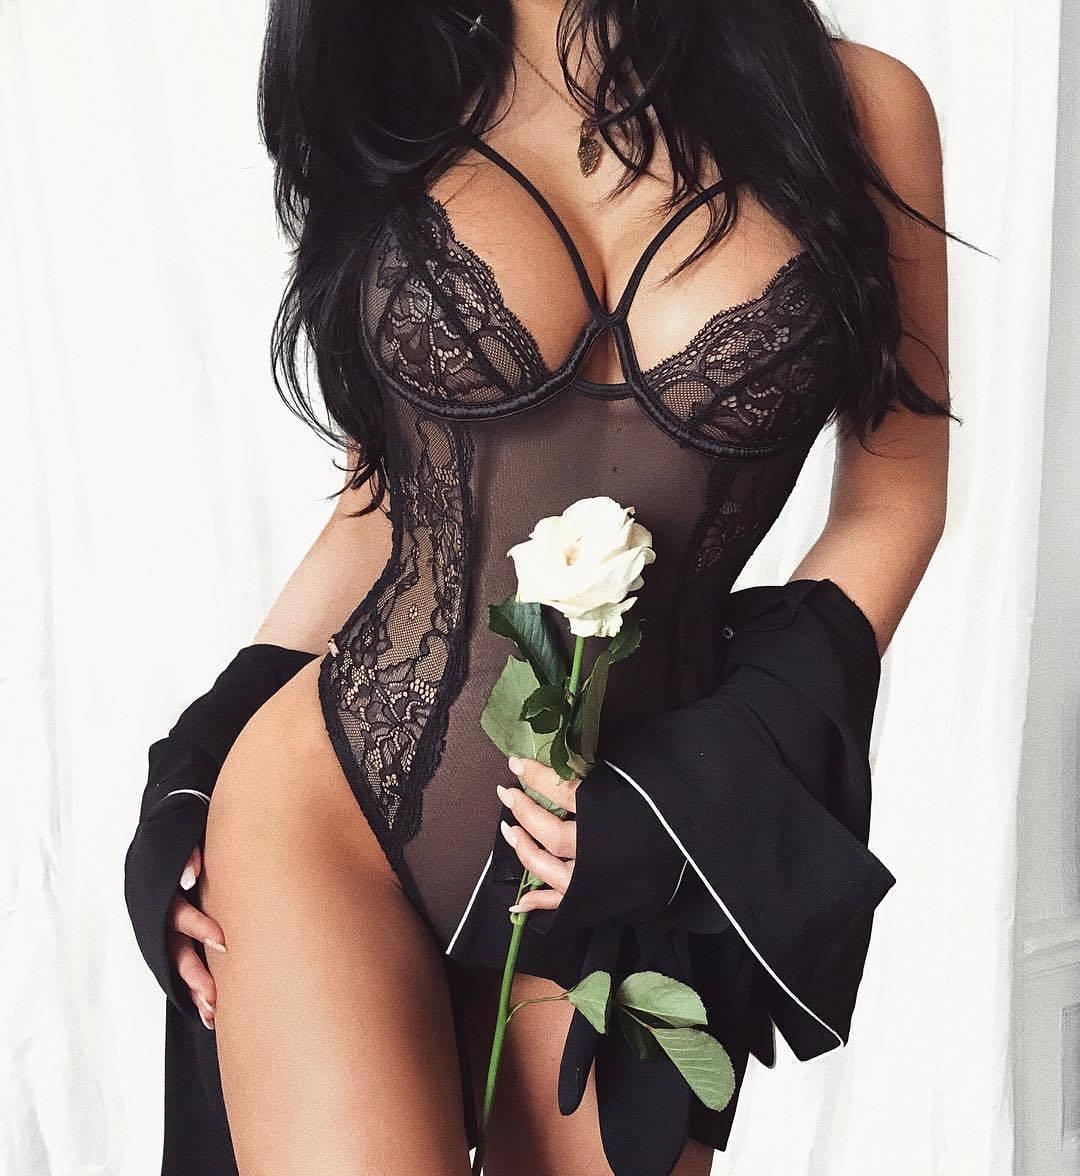 HIRIGIN Women Bodysuit Sissy/Sexy Lingerie Lace Babydoll Thong Nightwear Sexy Underwear S-XXL